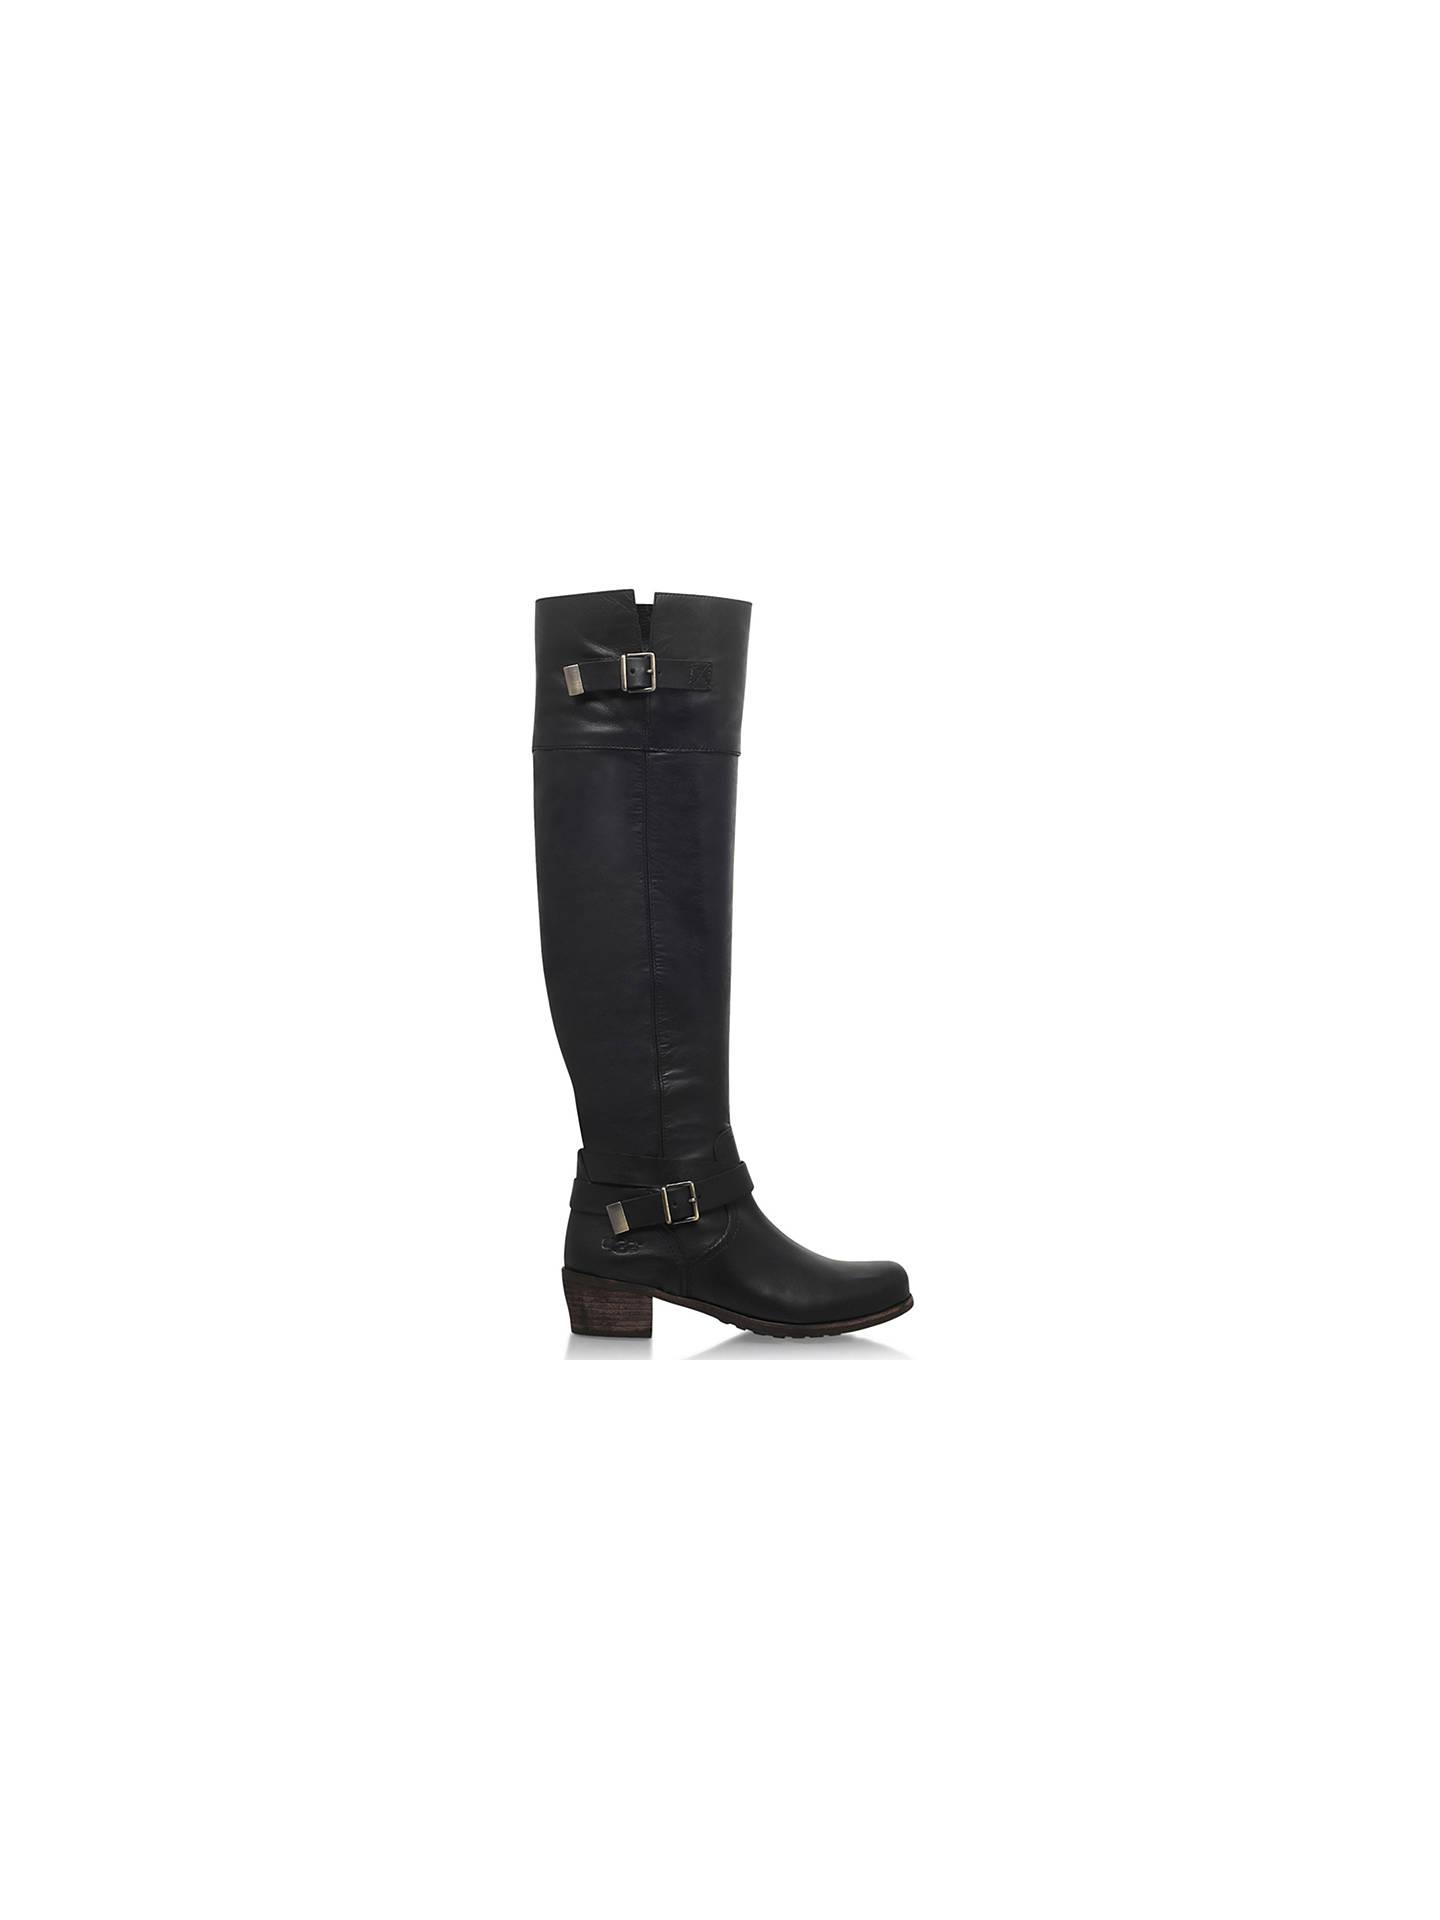 8f8cd10f75a UGG Bess High Leg Boots, Black at John Lewis & Partners